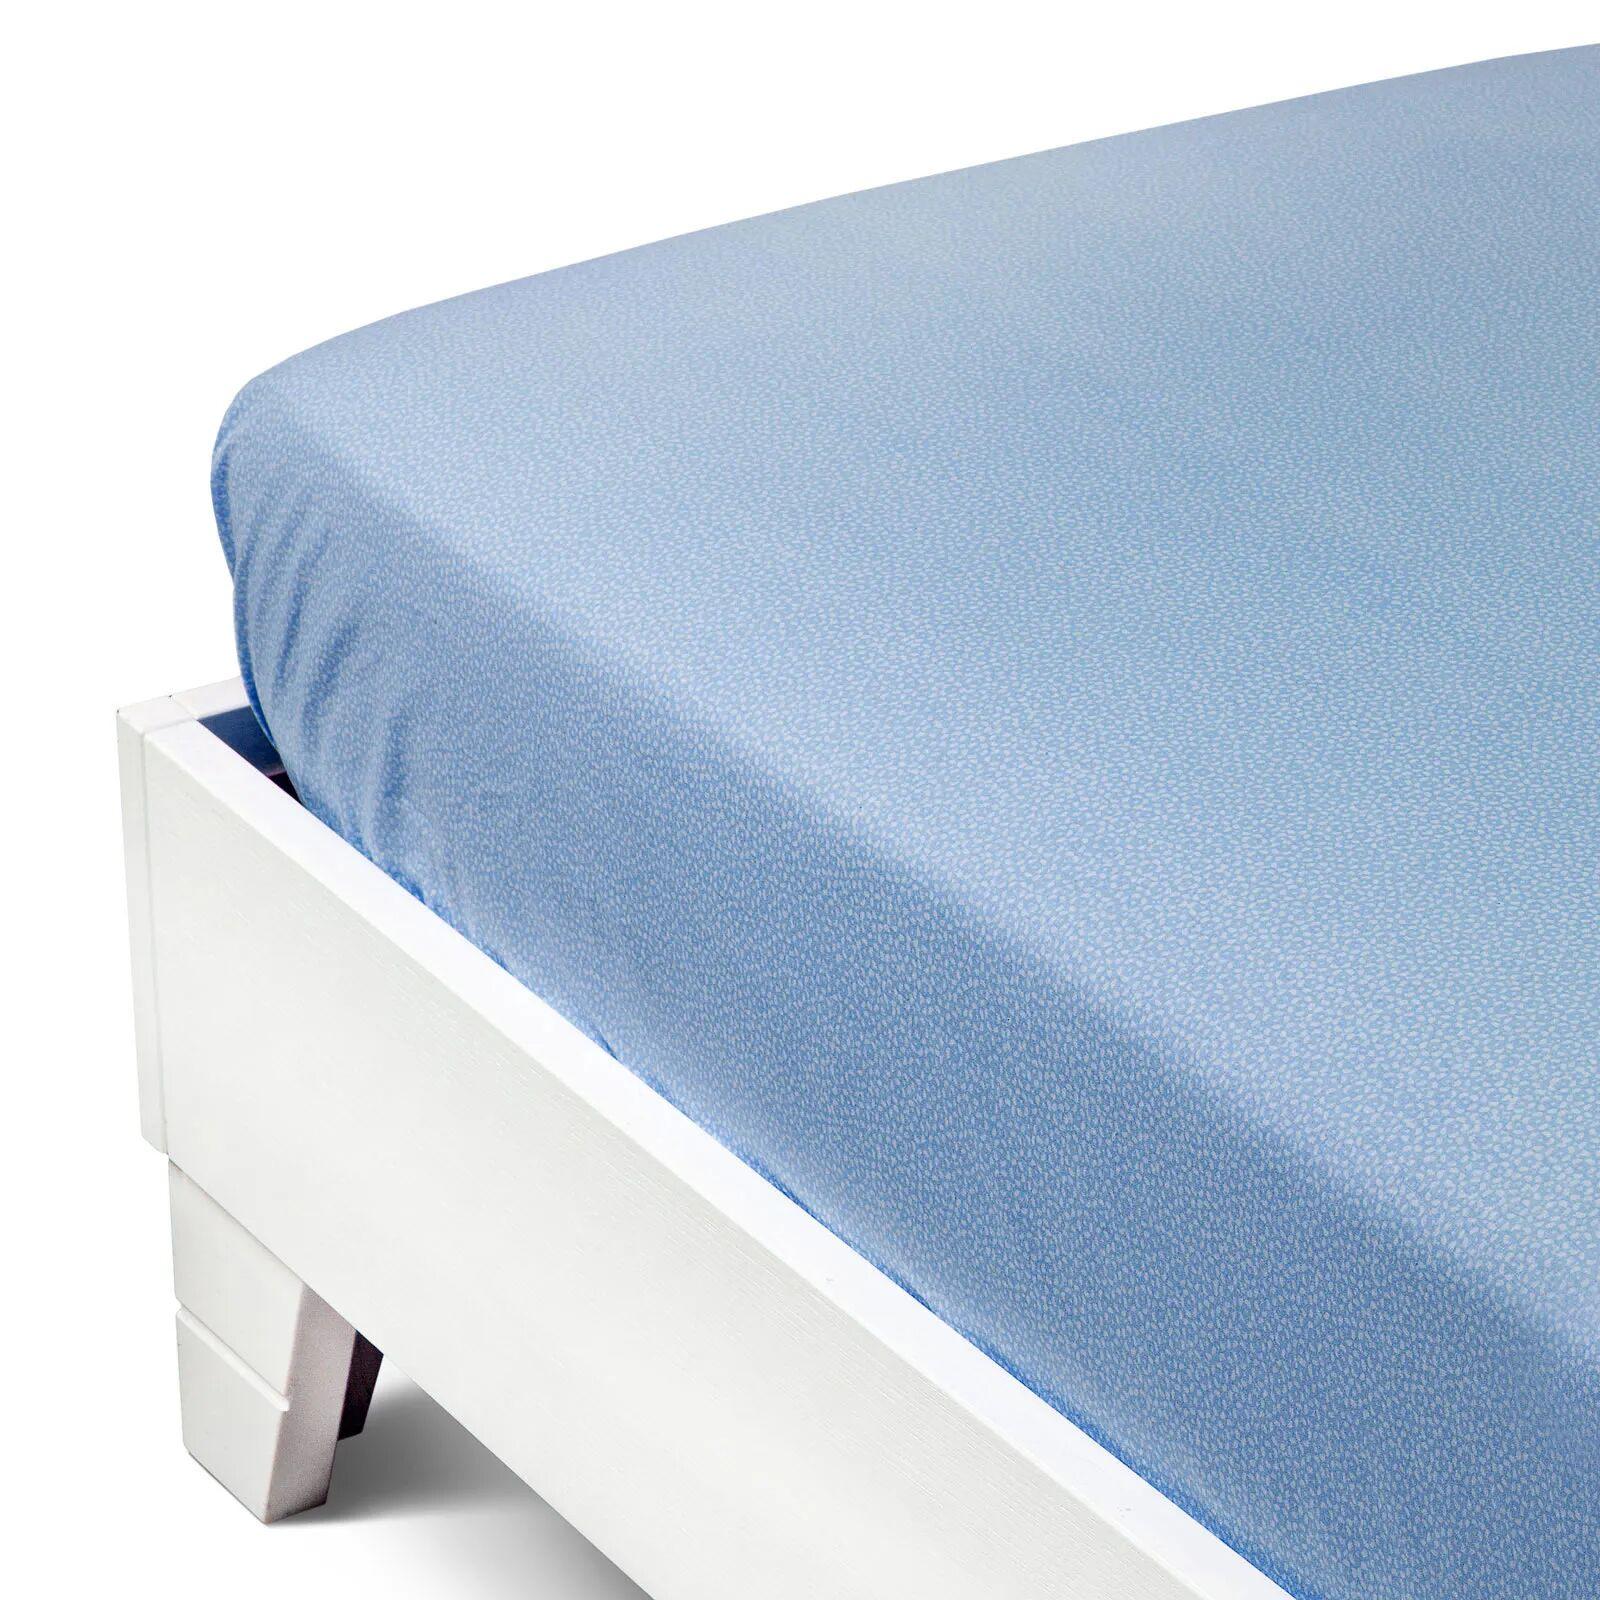 caleffi lenzuolo sotto con angoli  joy singolo blu in cotone